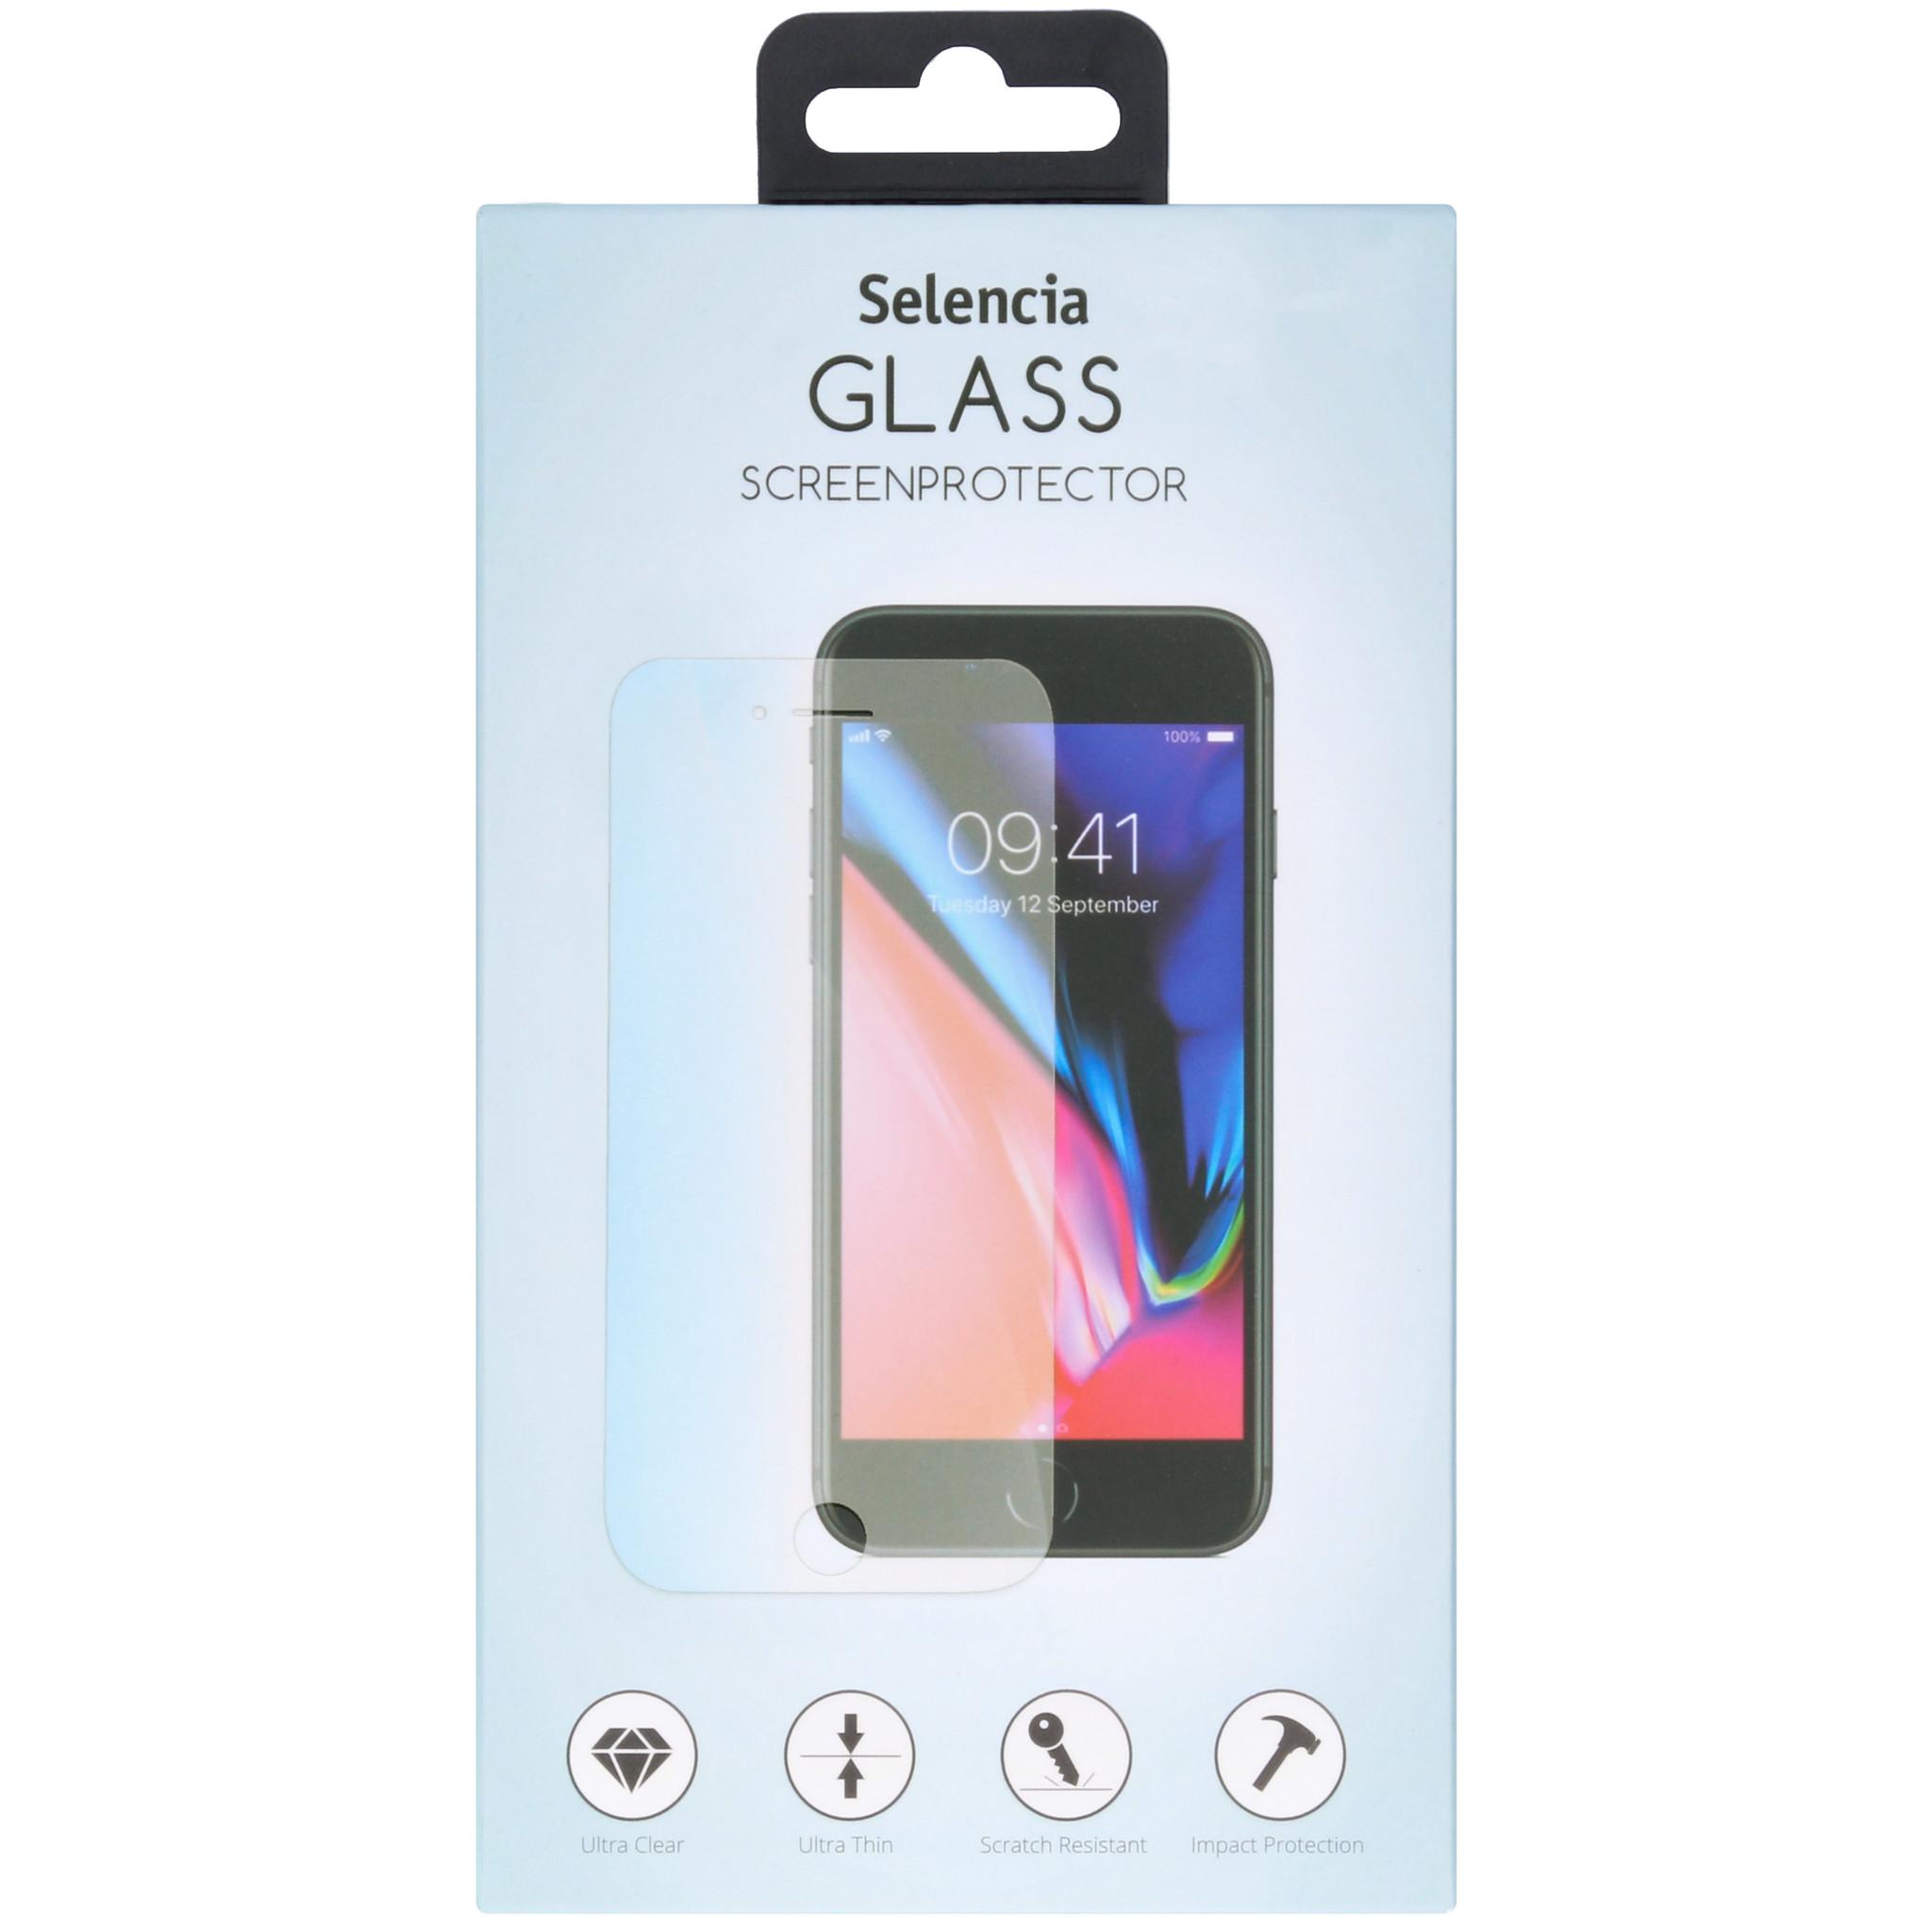 Selencia Gehard Glas Screenprotector Xiaomi Pocophone F1